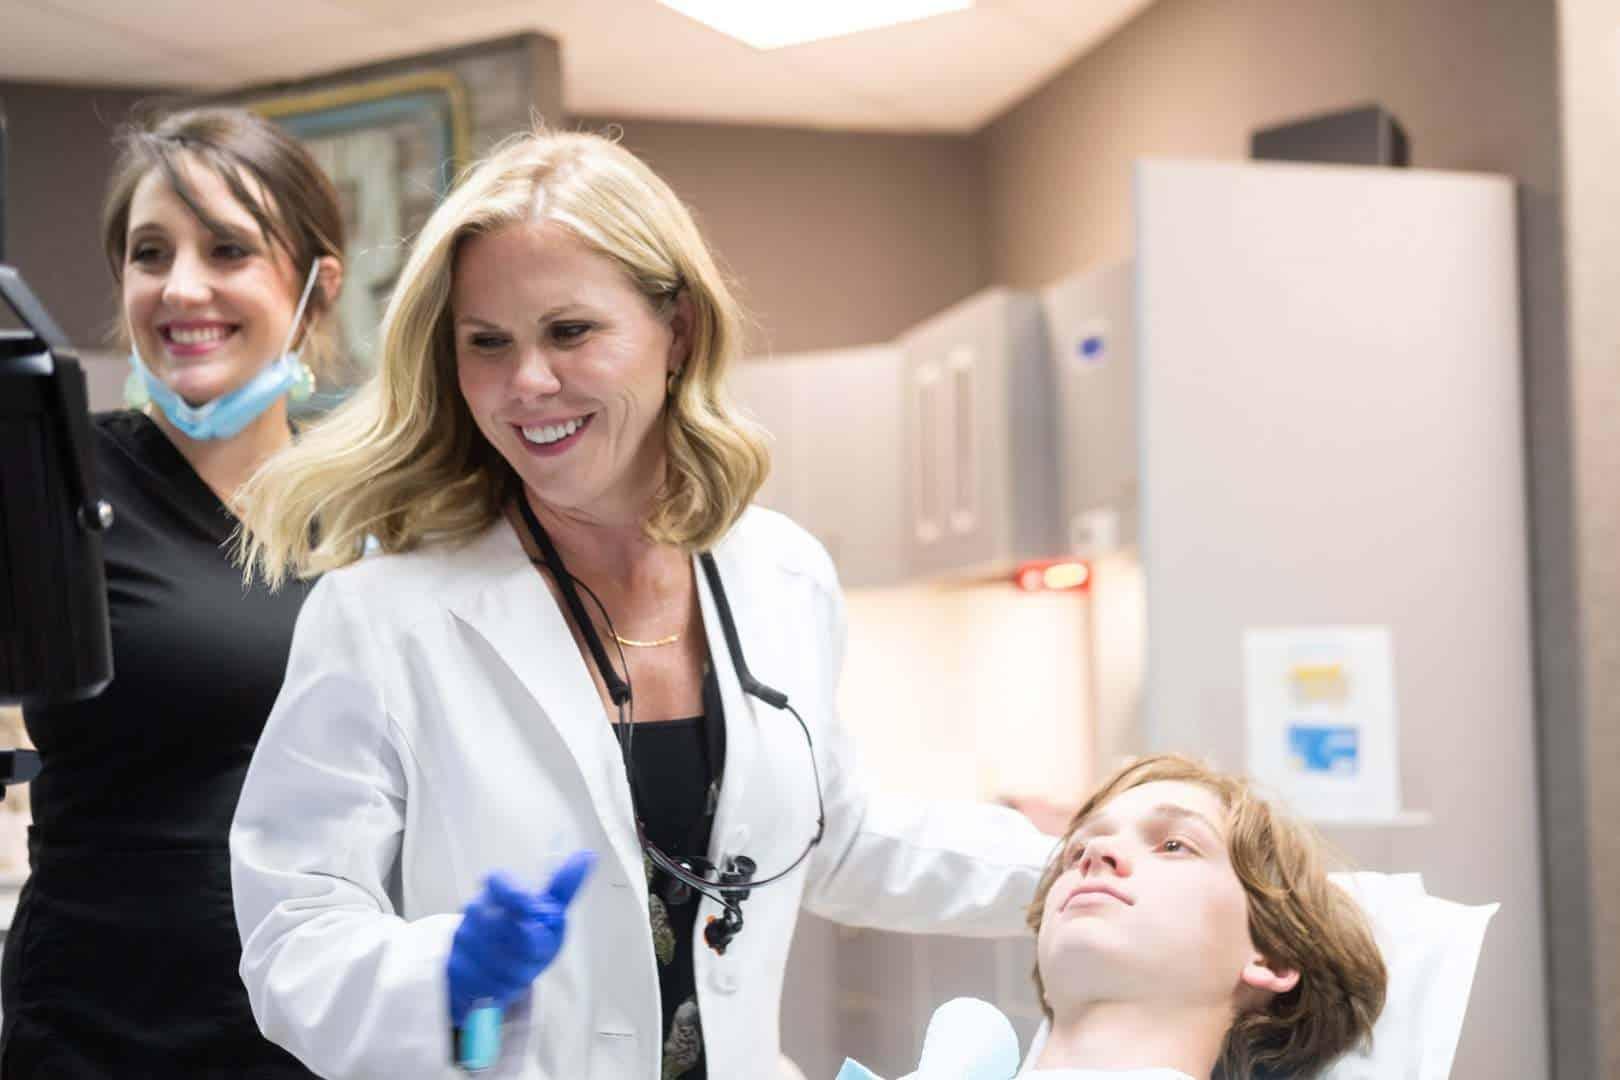 Doctor Candids Reuland Orthodontics 2018 1 1 - Orthodontics, Invisalign and Braces